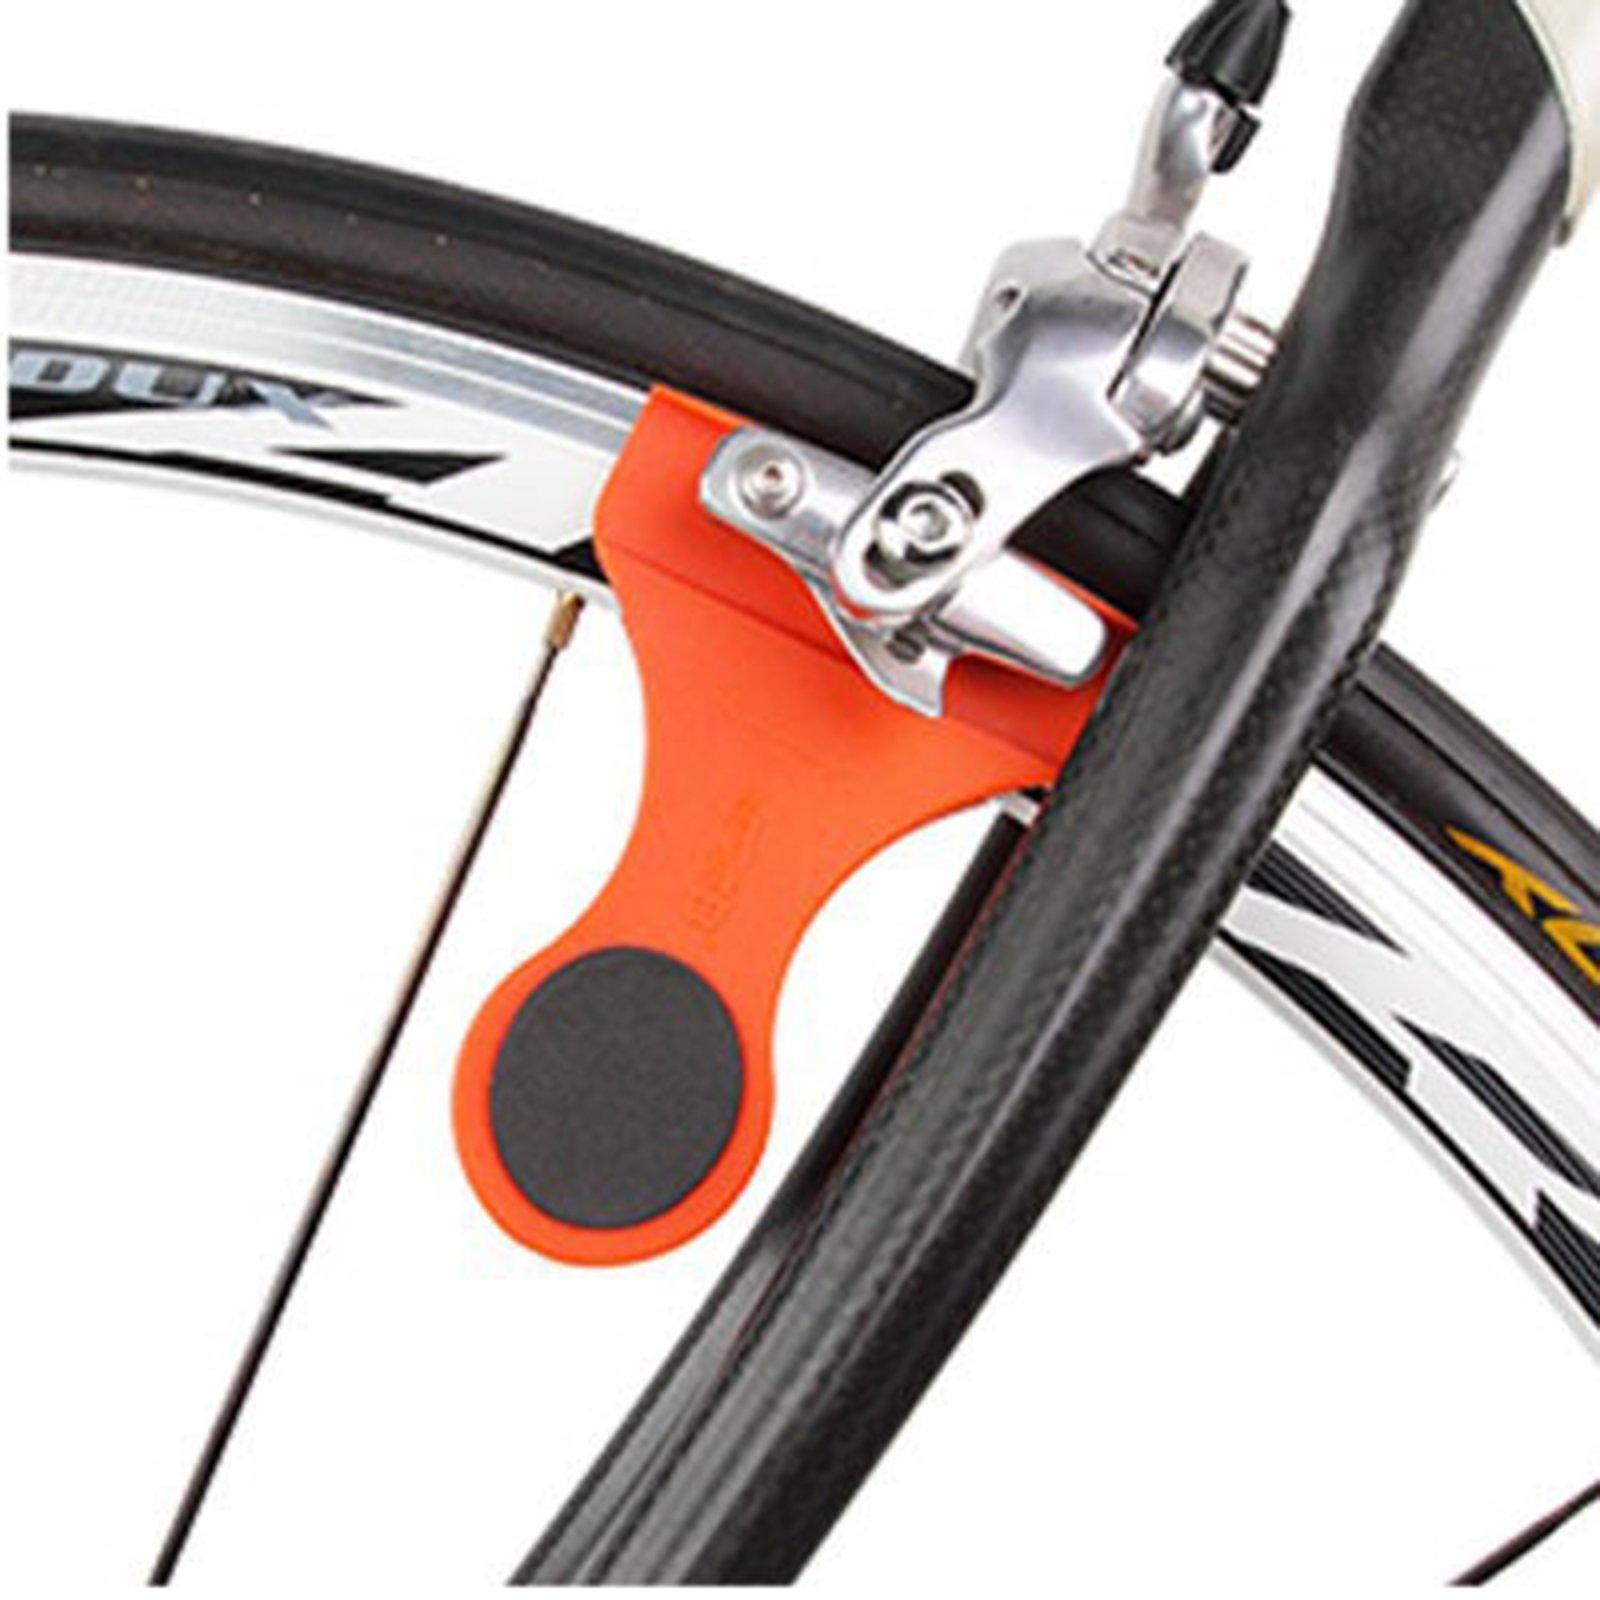 Equilibrador de Zapatas de Freno para Bicicleta Herramienta Super ...